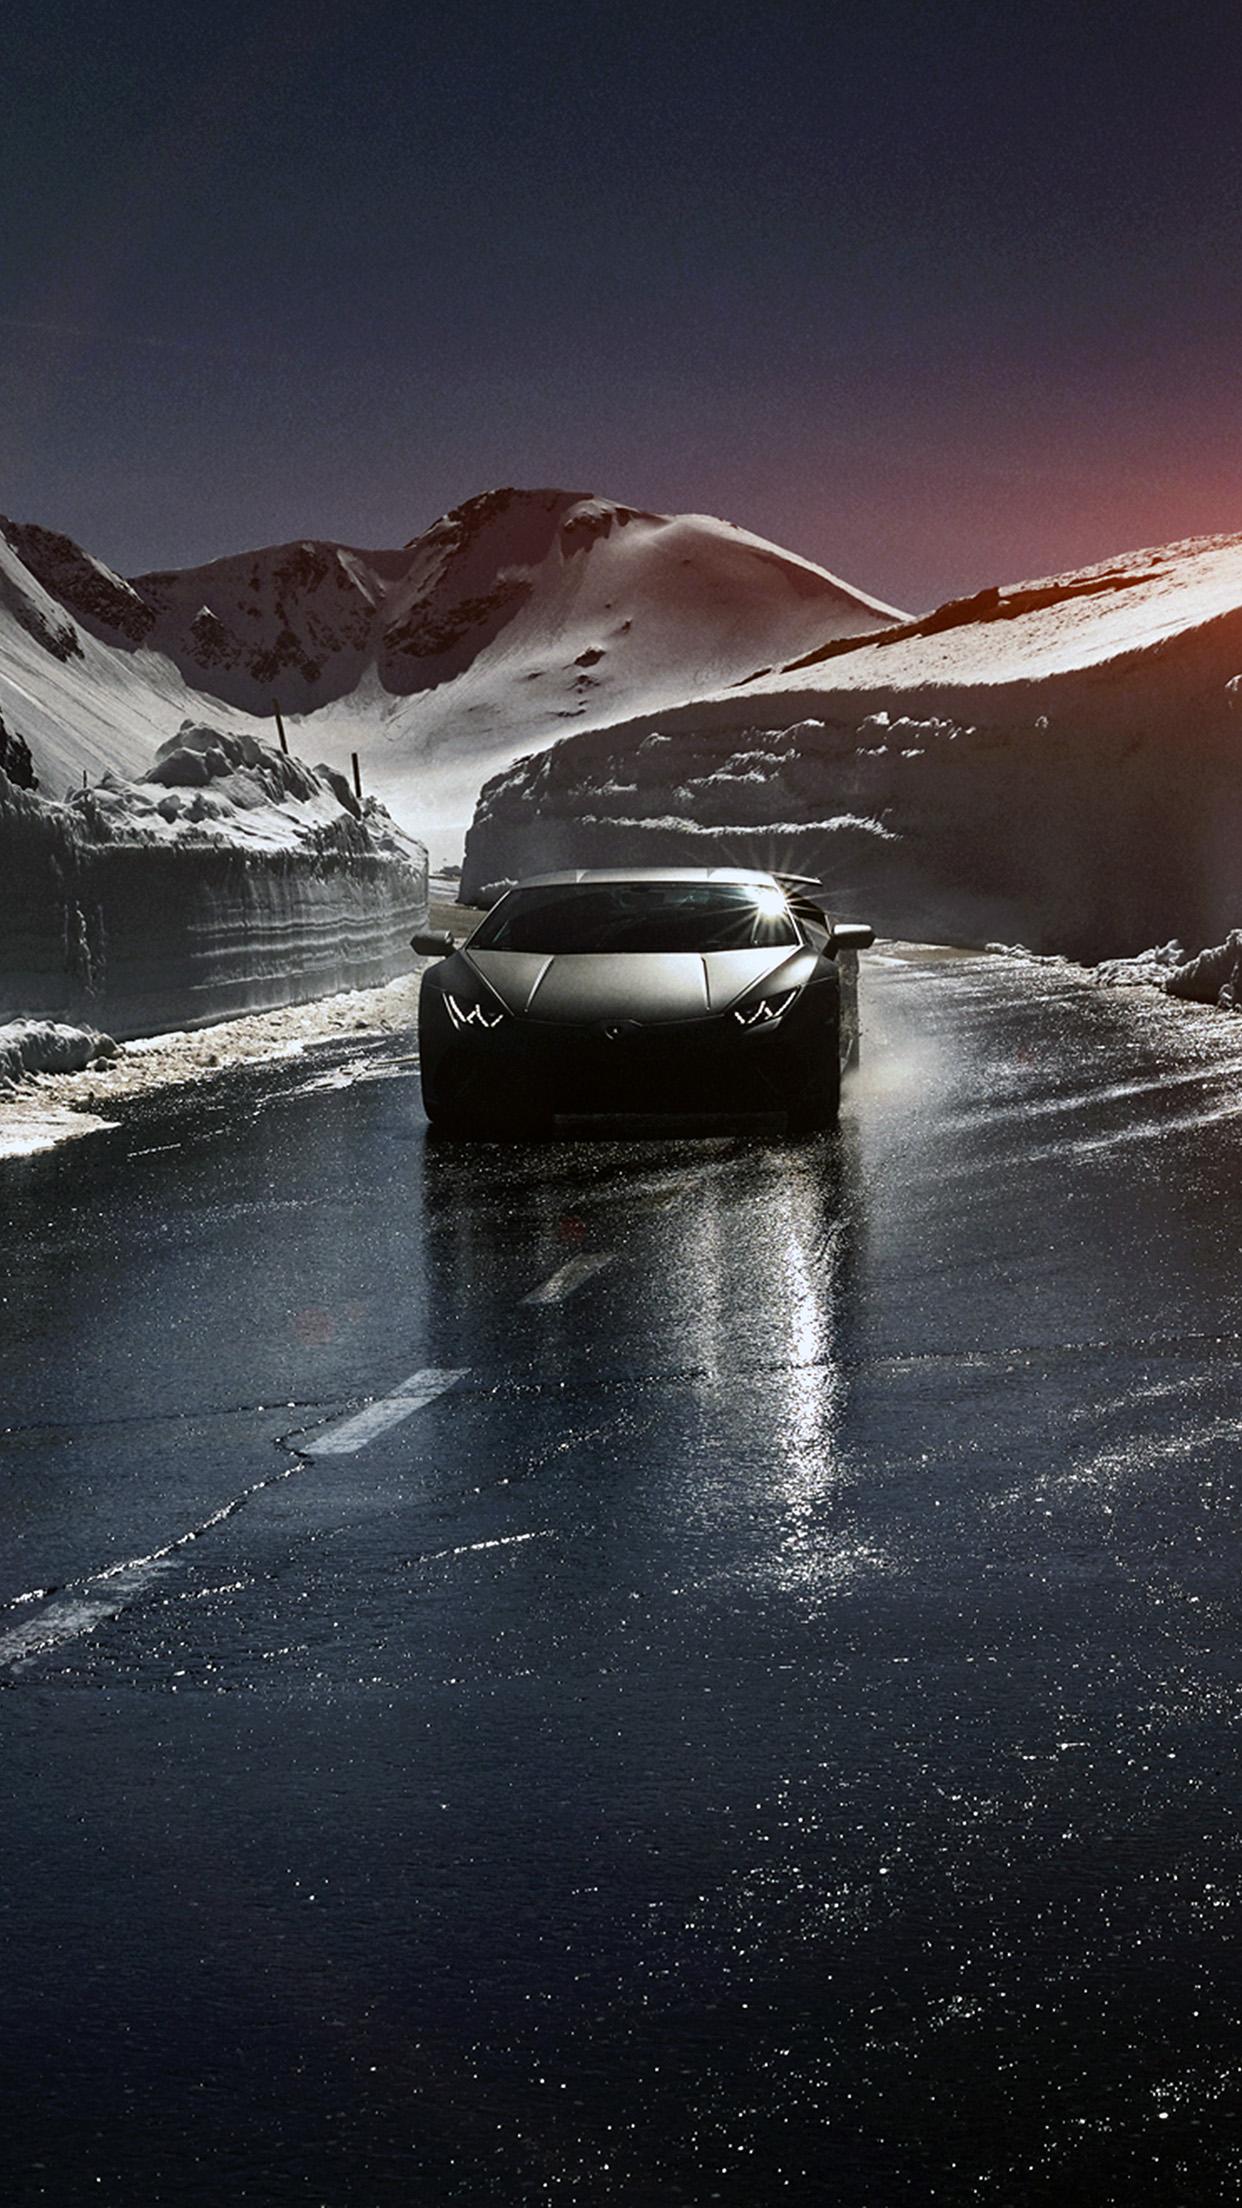 iPhone11papers.com | iPhone11 wallpaper | bg86-car-lamborghini-car -dark-road-drive-art-winter